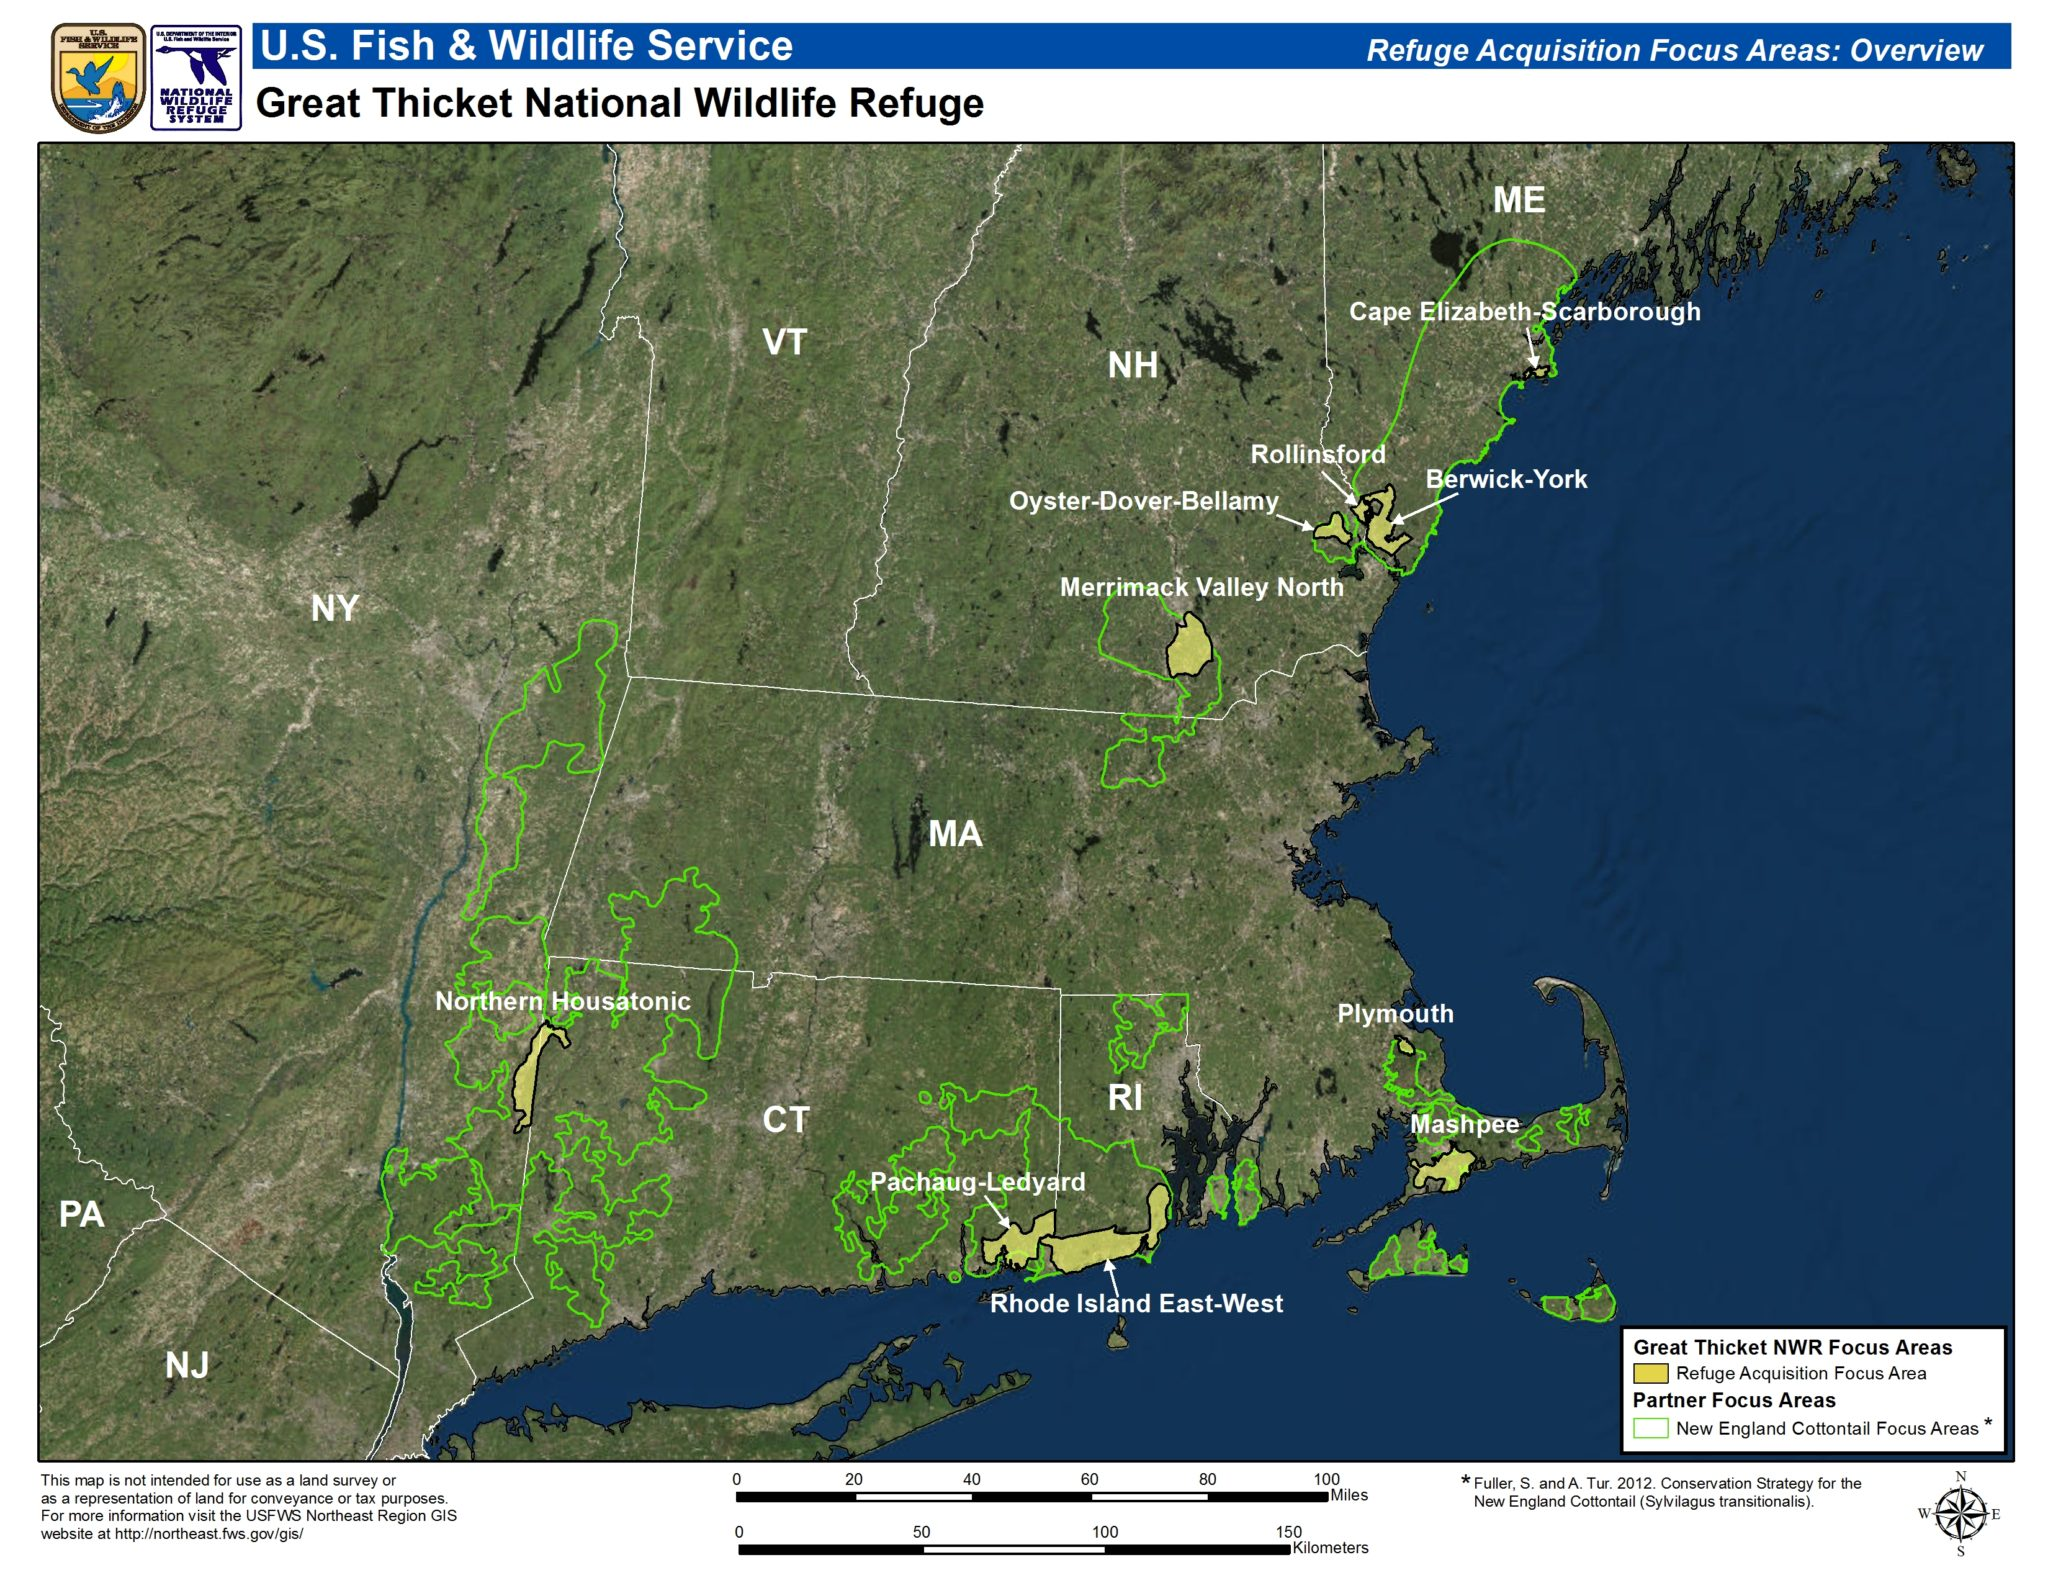 Northeast Overview